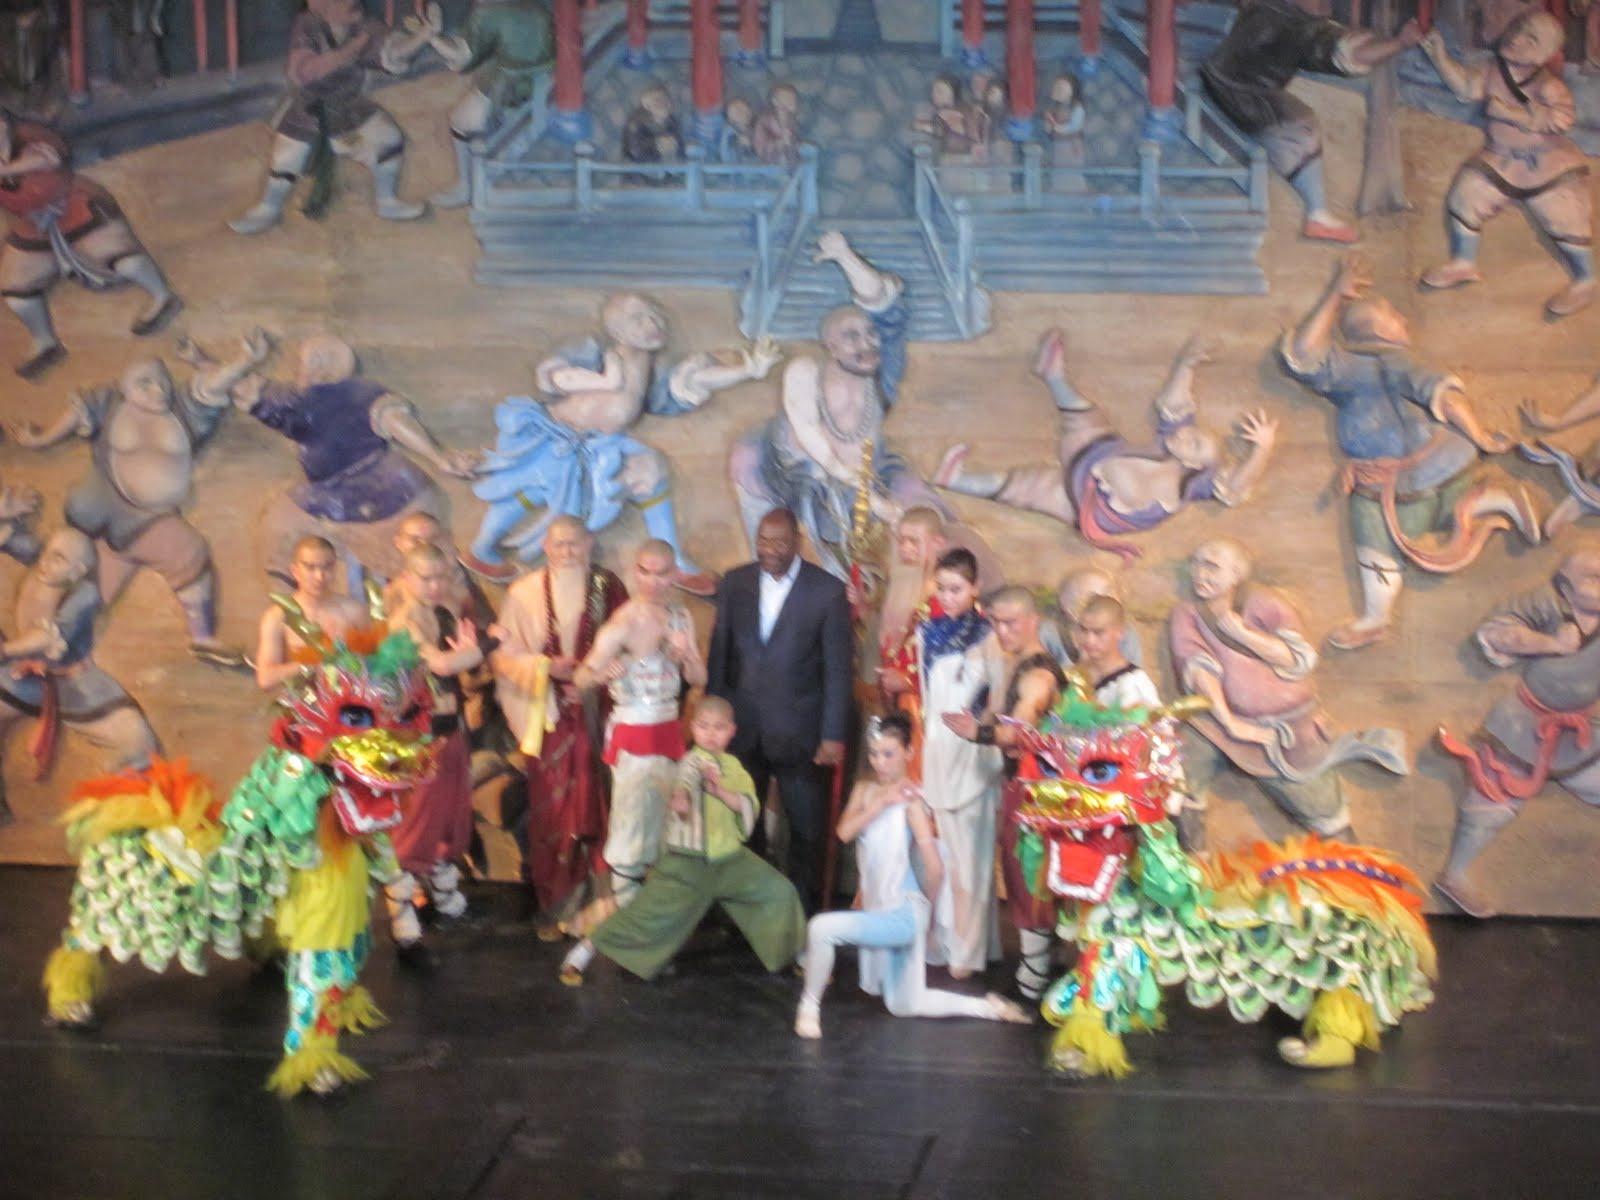 kultur hong kong den kinesiske catwalken .